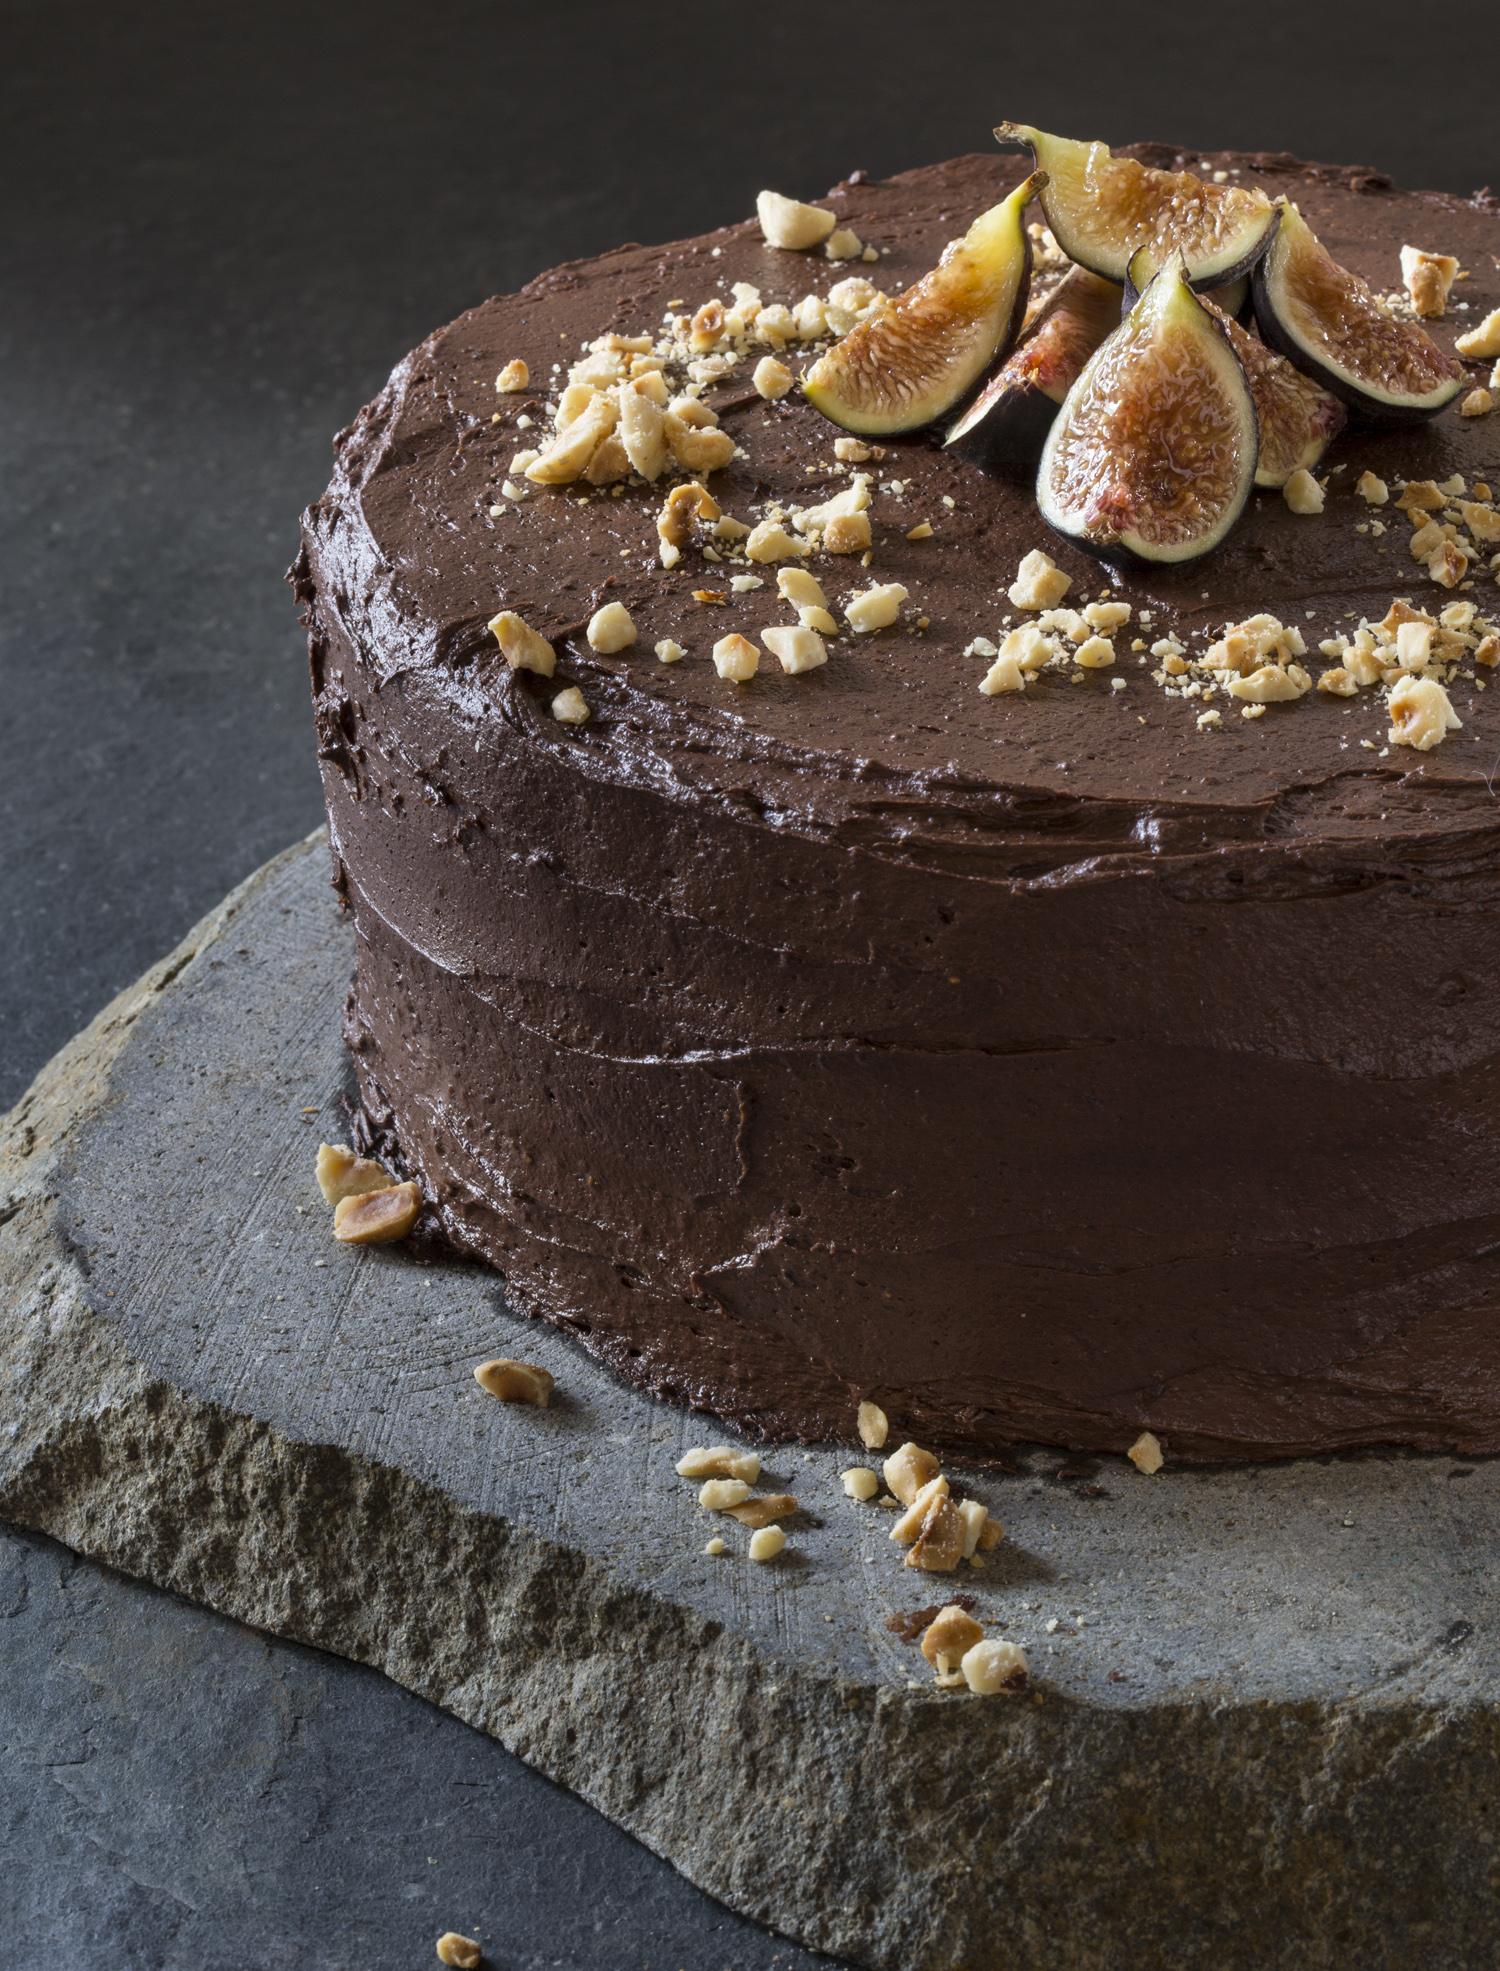 Recipe Decadent Dark Chocolate Cake With Figs And Hazelnuts